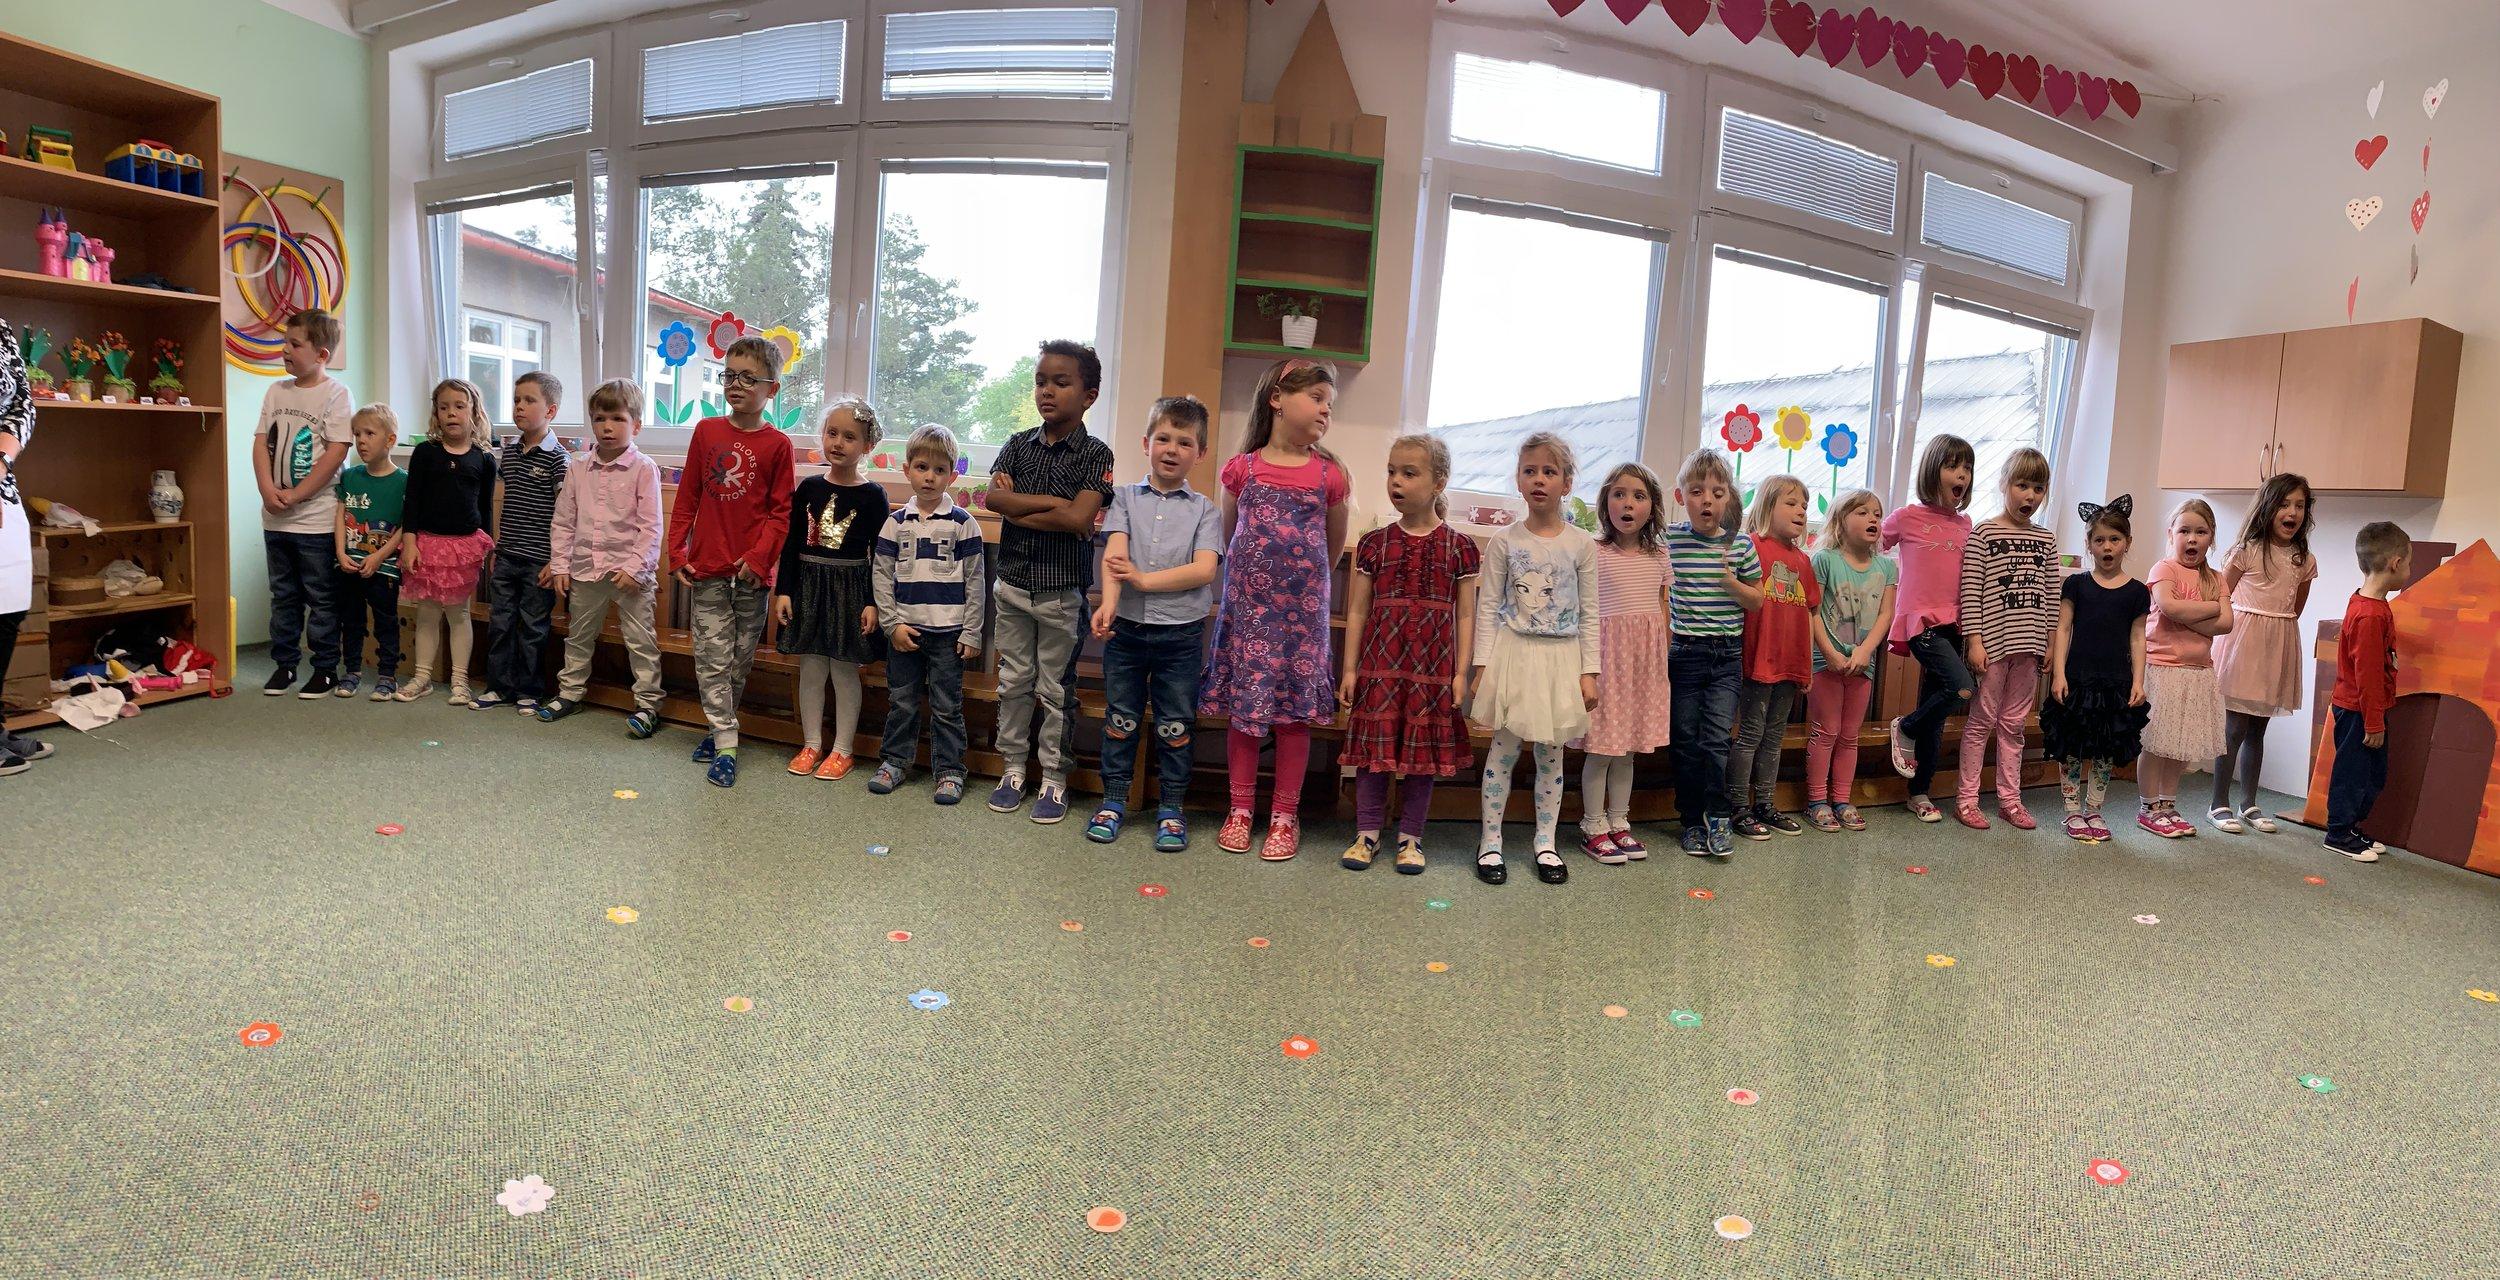 Nora's Školka class